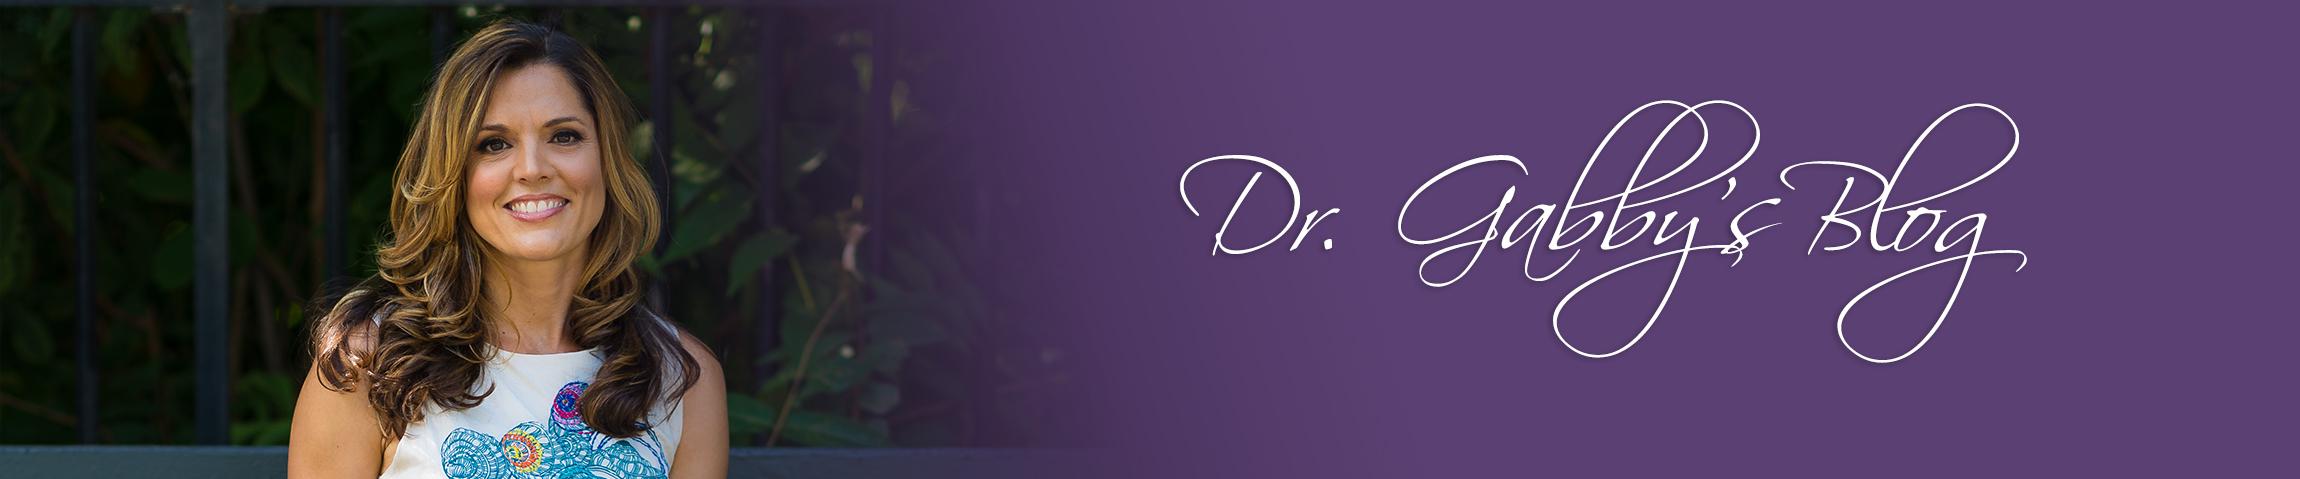 Dr. Gabby's Blog